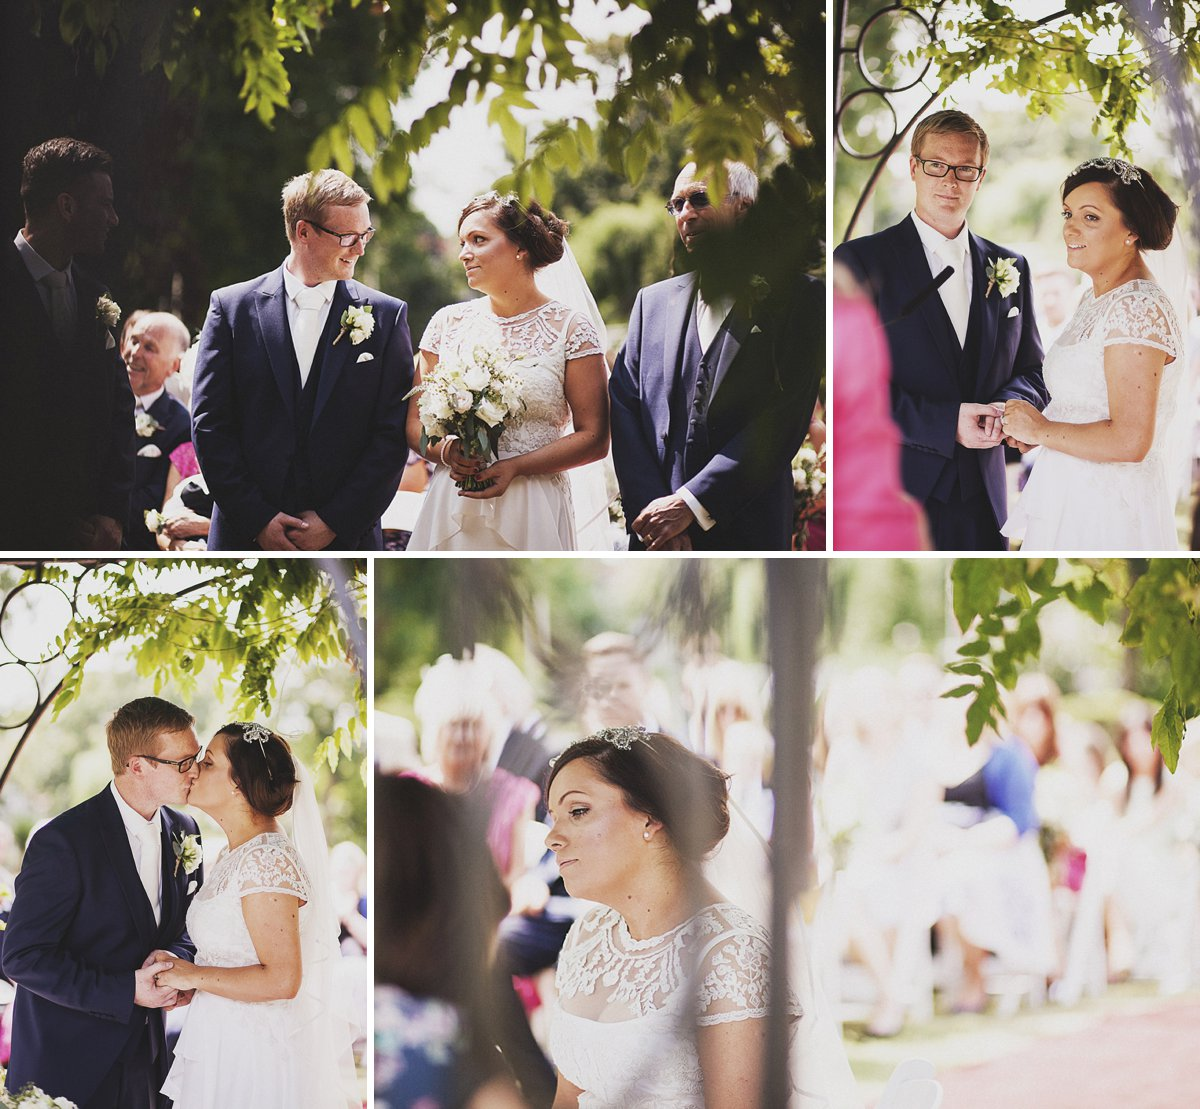 wedding-photographer-manchester-026